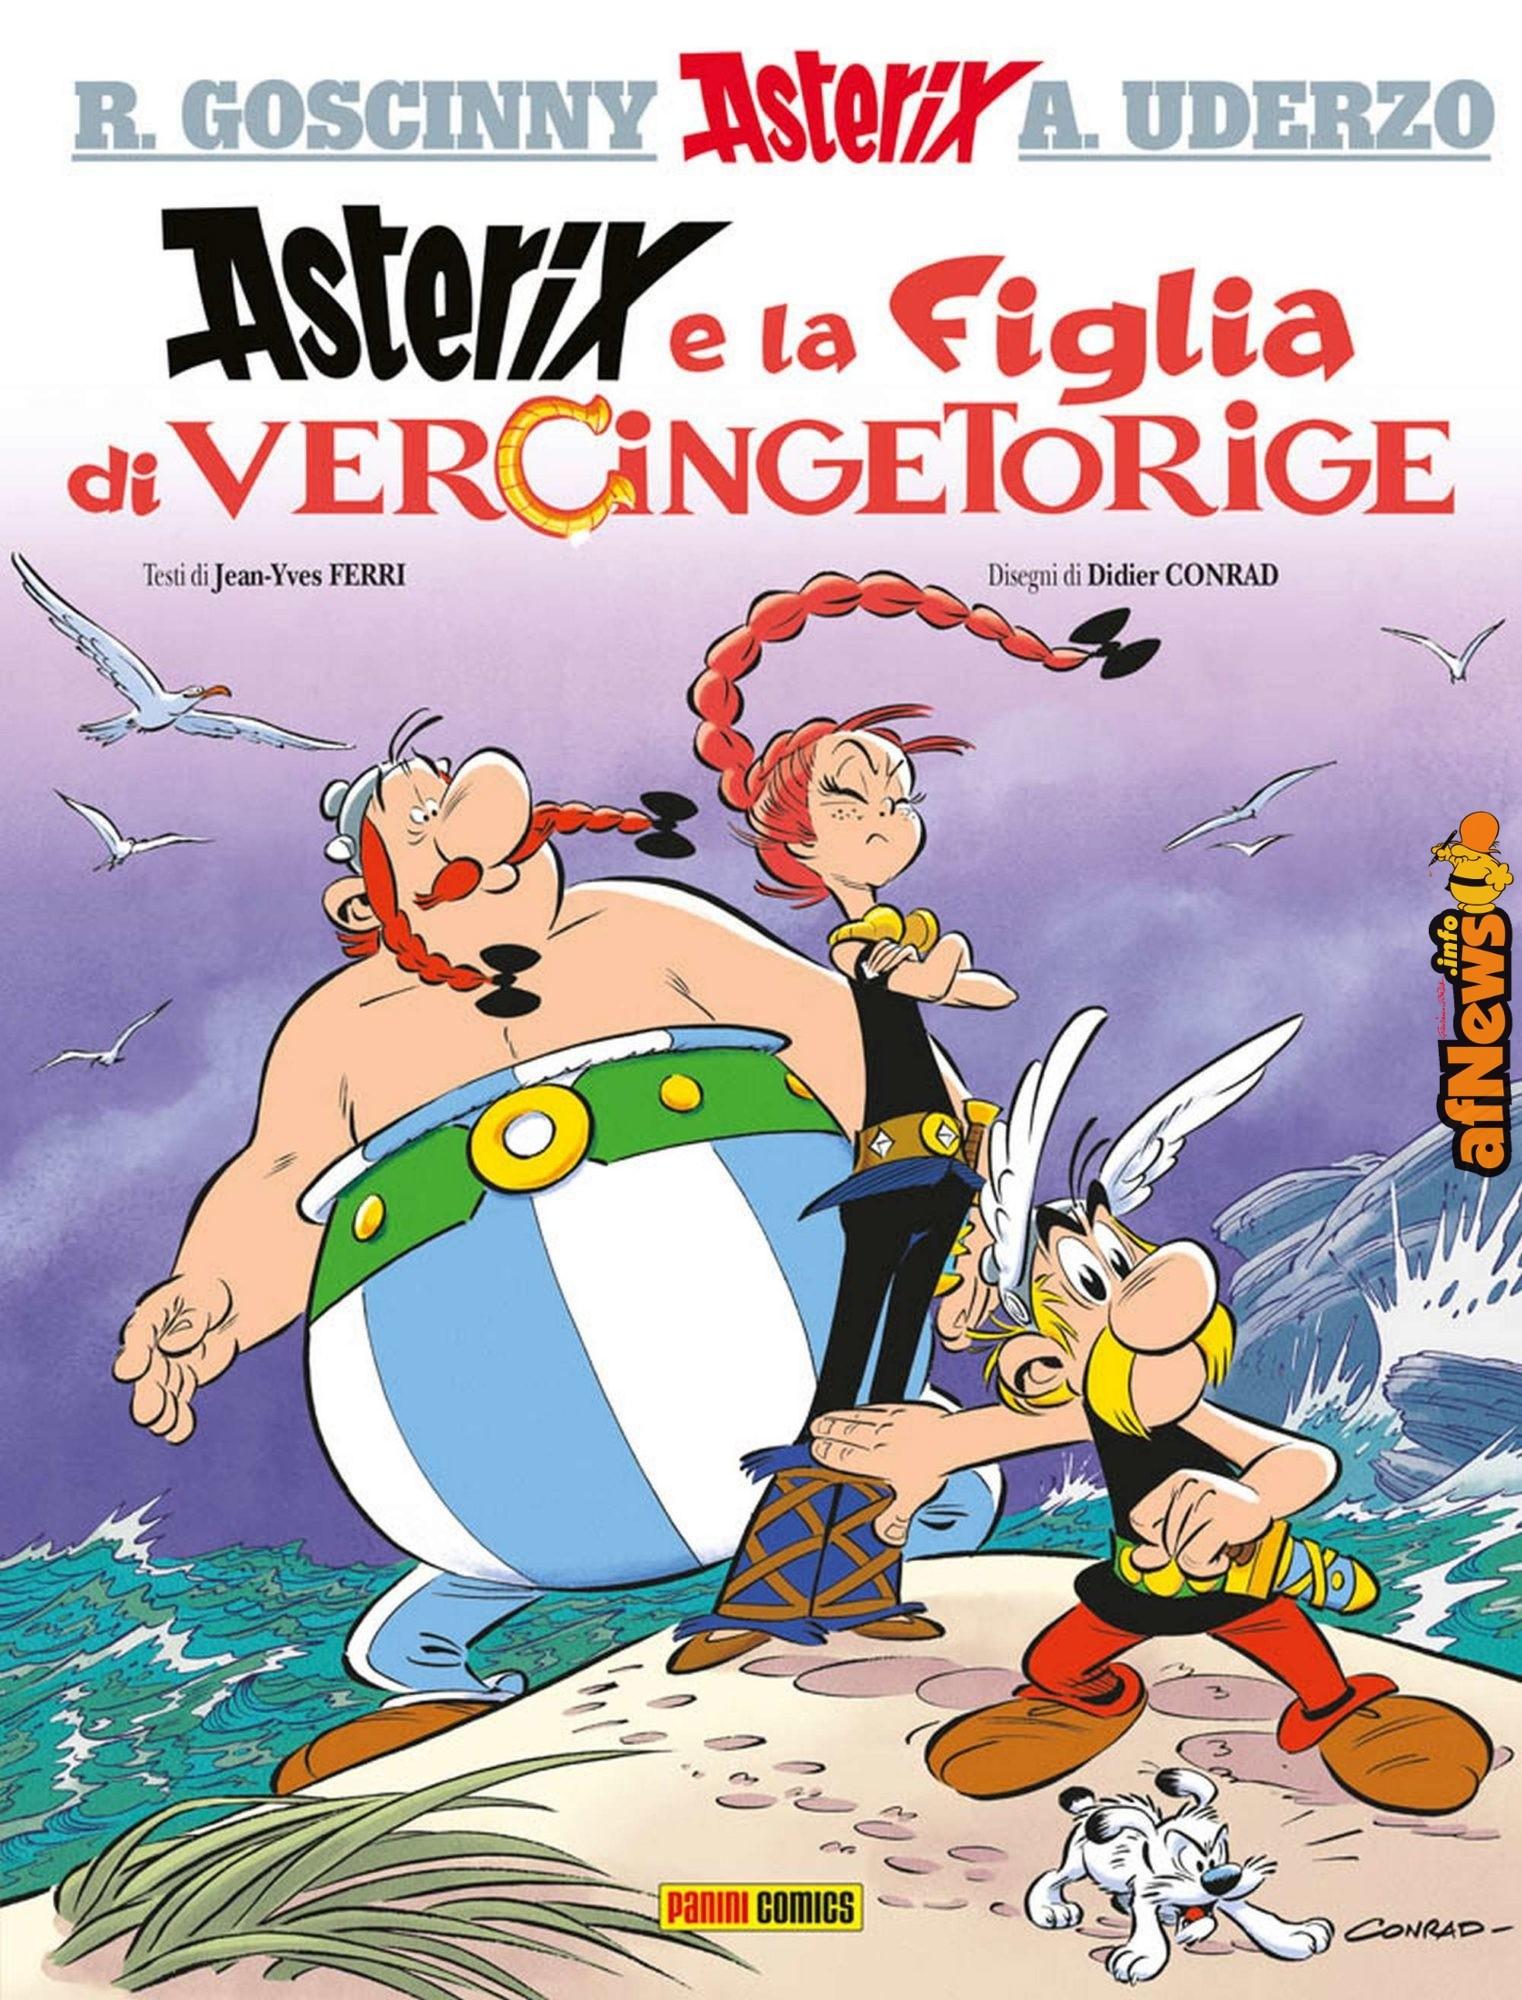 Calendario Romano 2020 Kaufen Más Arriba-a-fecha asterix 38 La Figlia Di Vercin orige Voil Afnewsfo Of Calendario Romano 2020 Kaufen Más Populares events